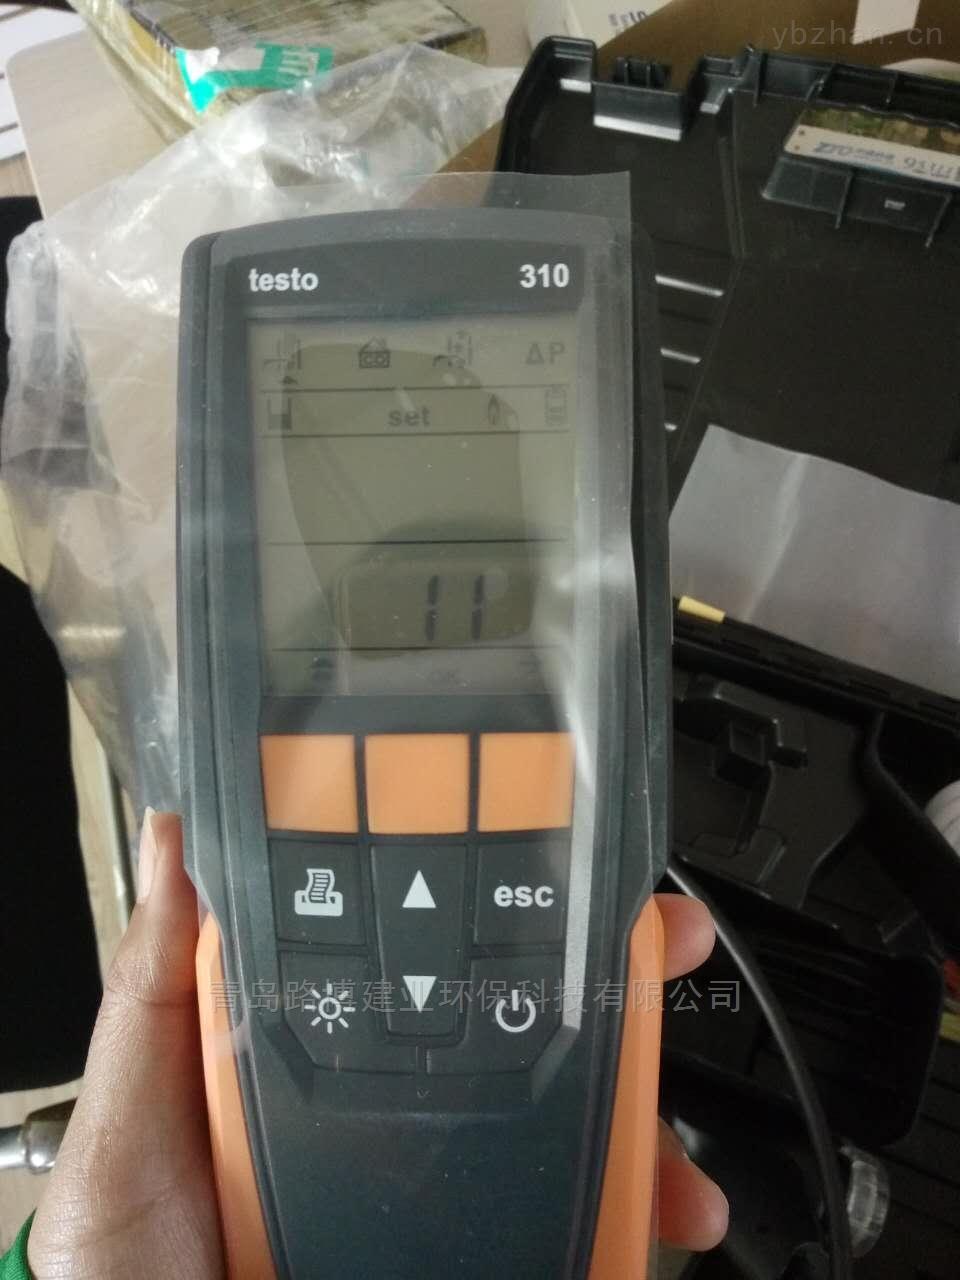 testo 310-电化学德国德图燃烧效率分析仪促销